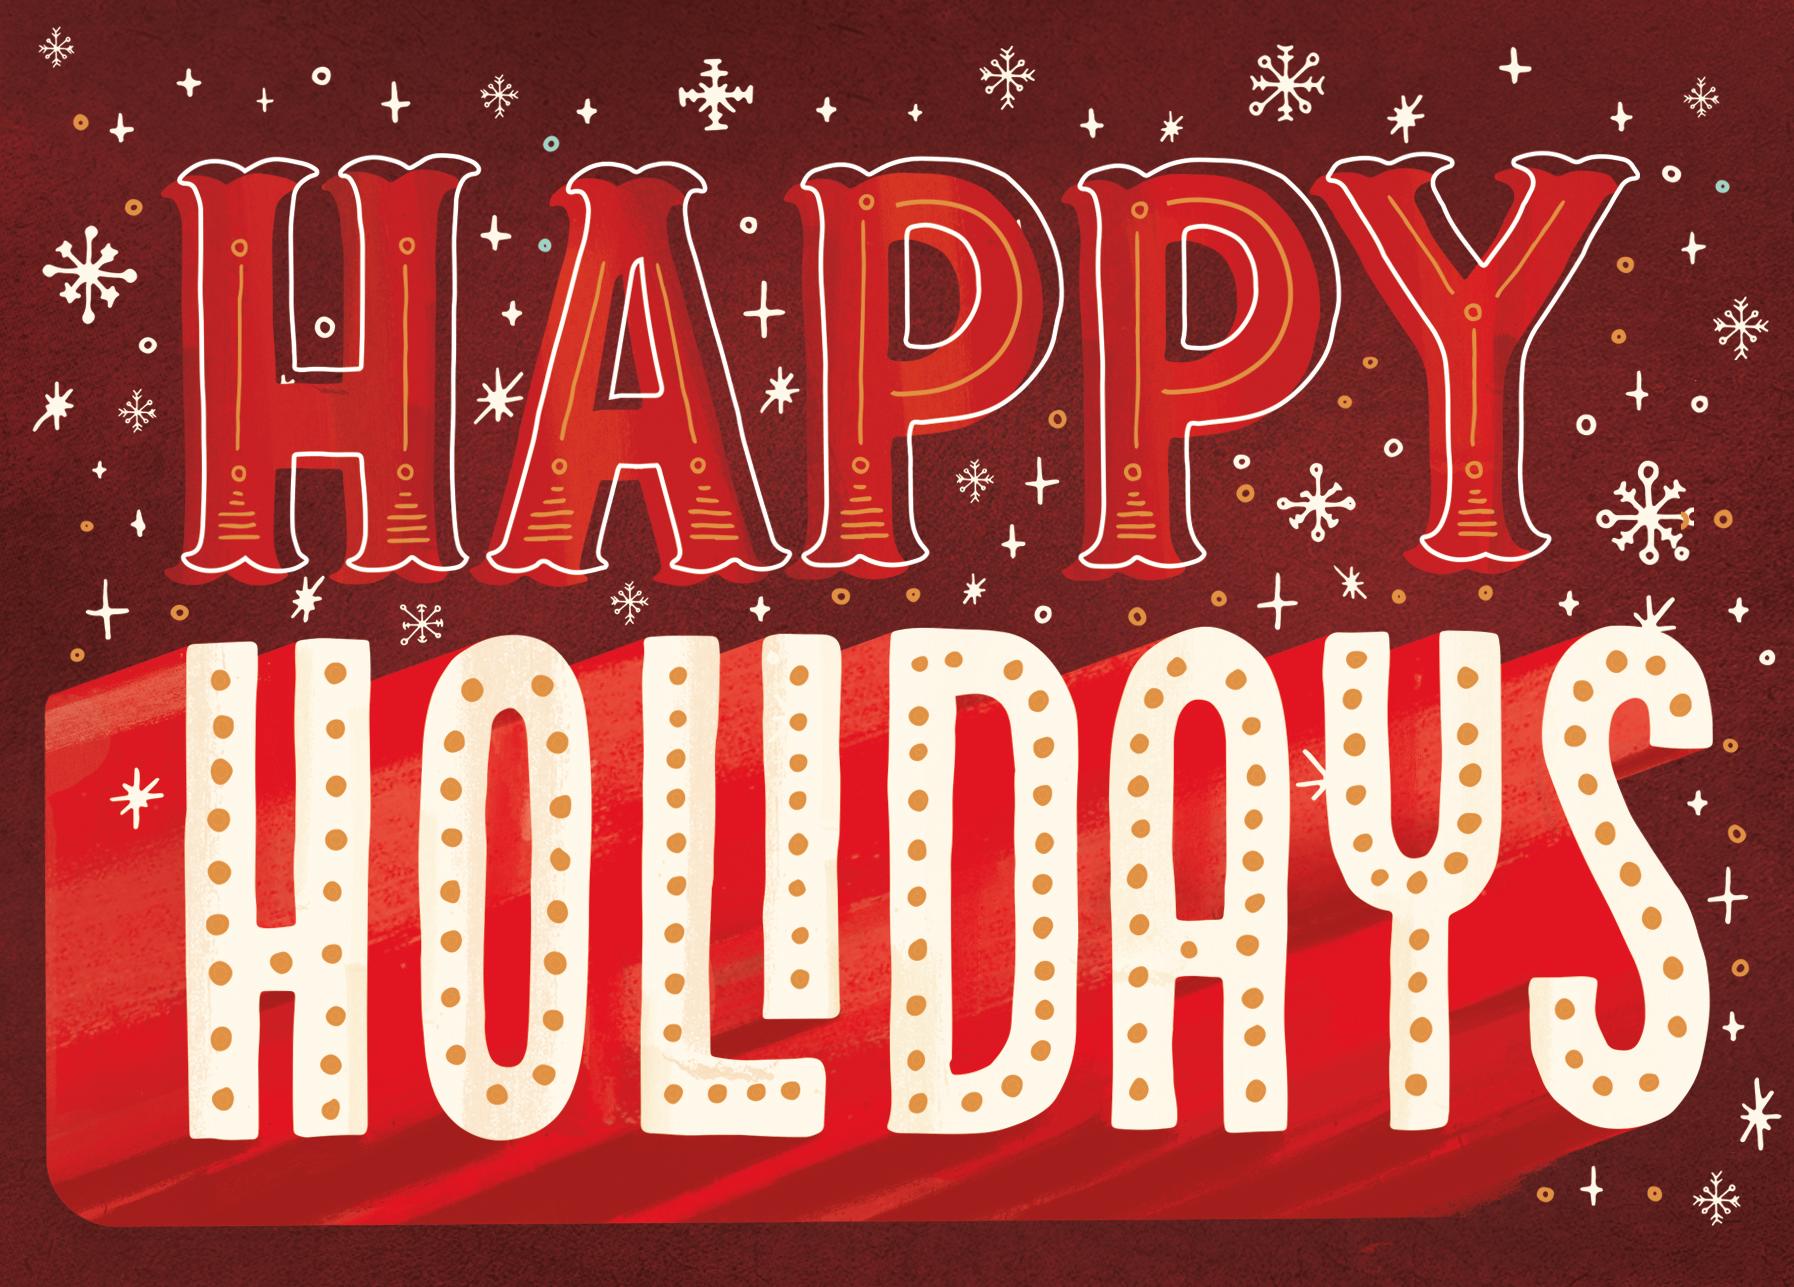 Joanna Behar Happy Holidays Holiday Calligraphy Seasons Greetings Quotes Holiday Fonts